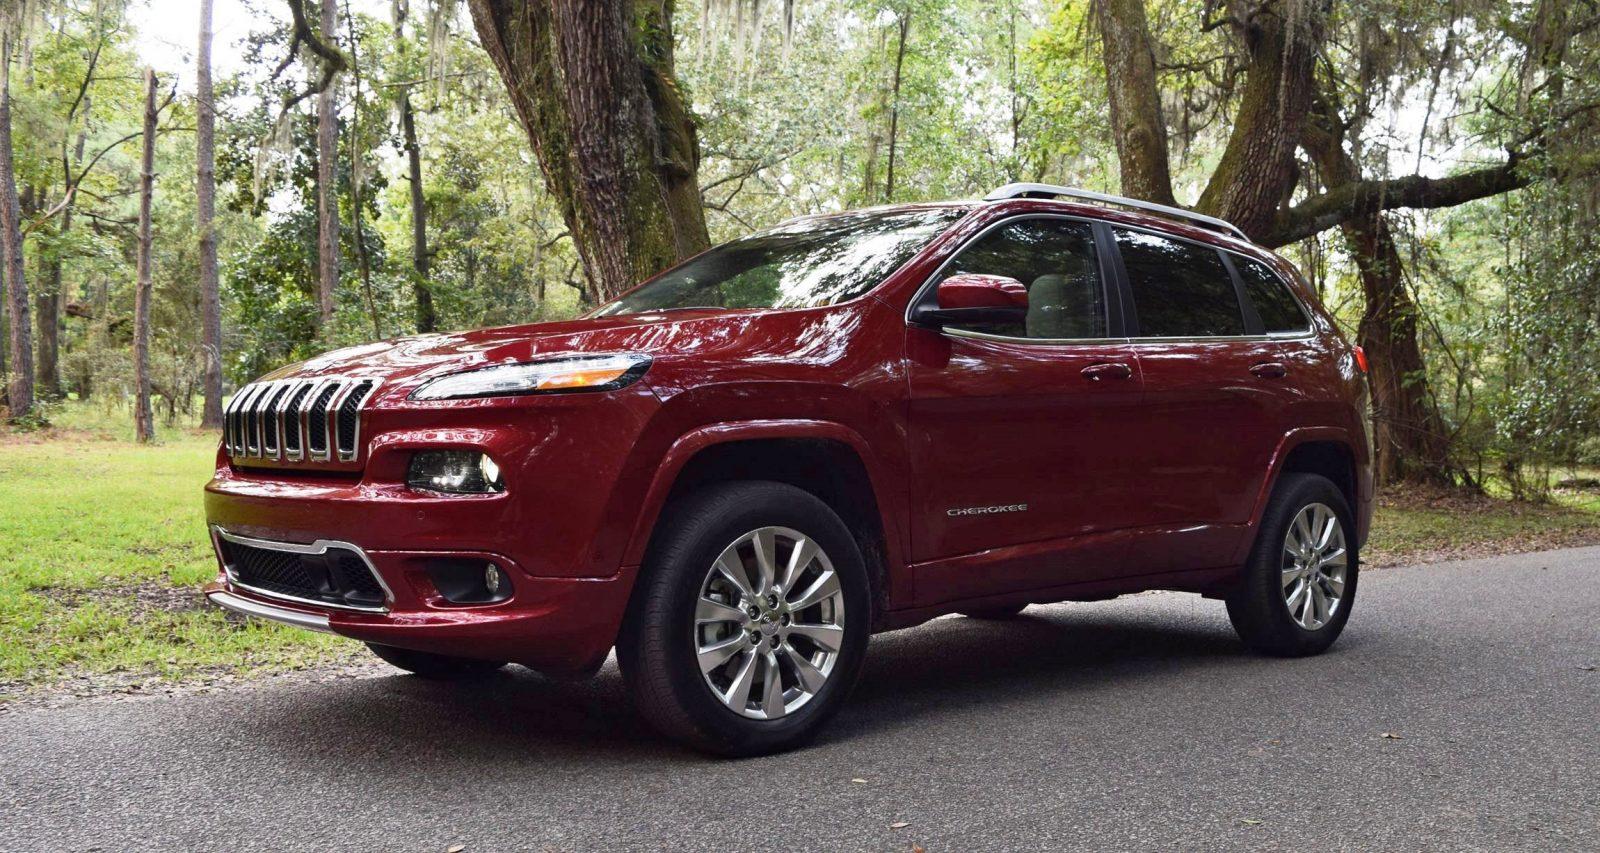 2016 jeep cherokee overland 4x4 v6 road test review. Black Bedroom Furniture Sets. Home Design Ideas